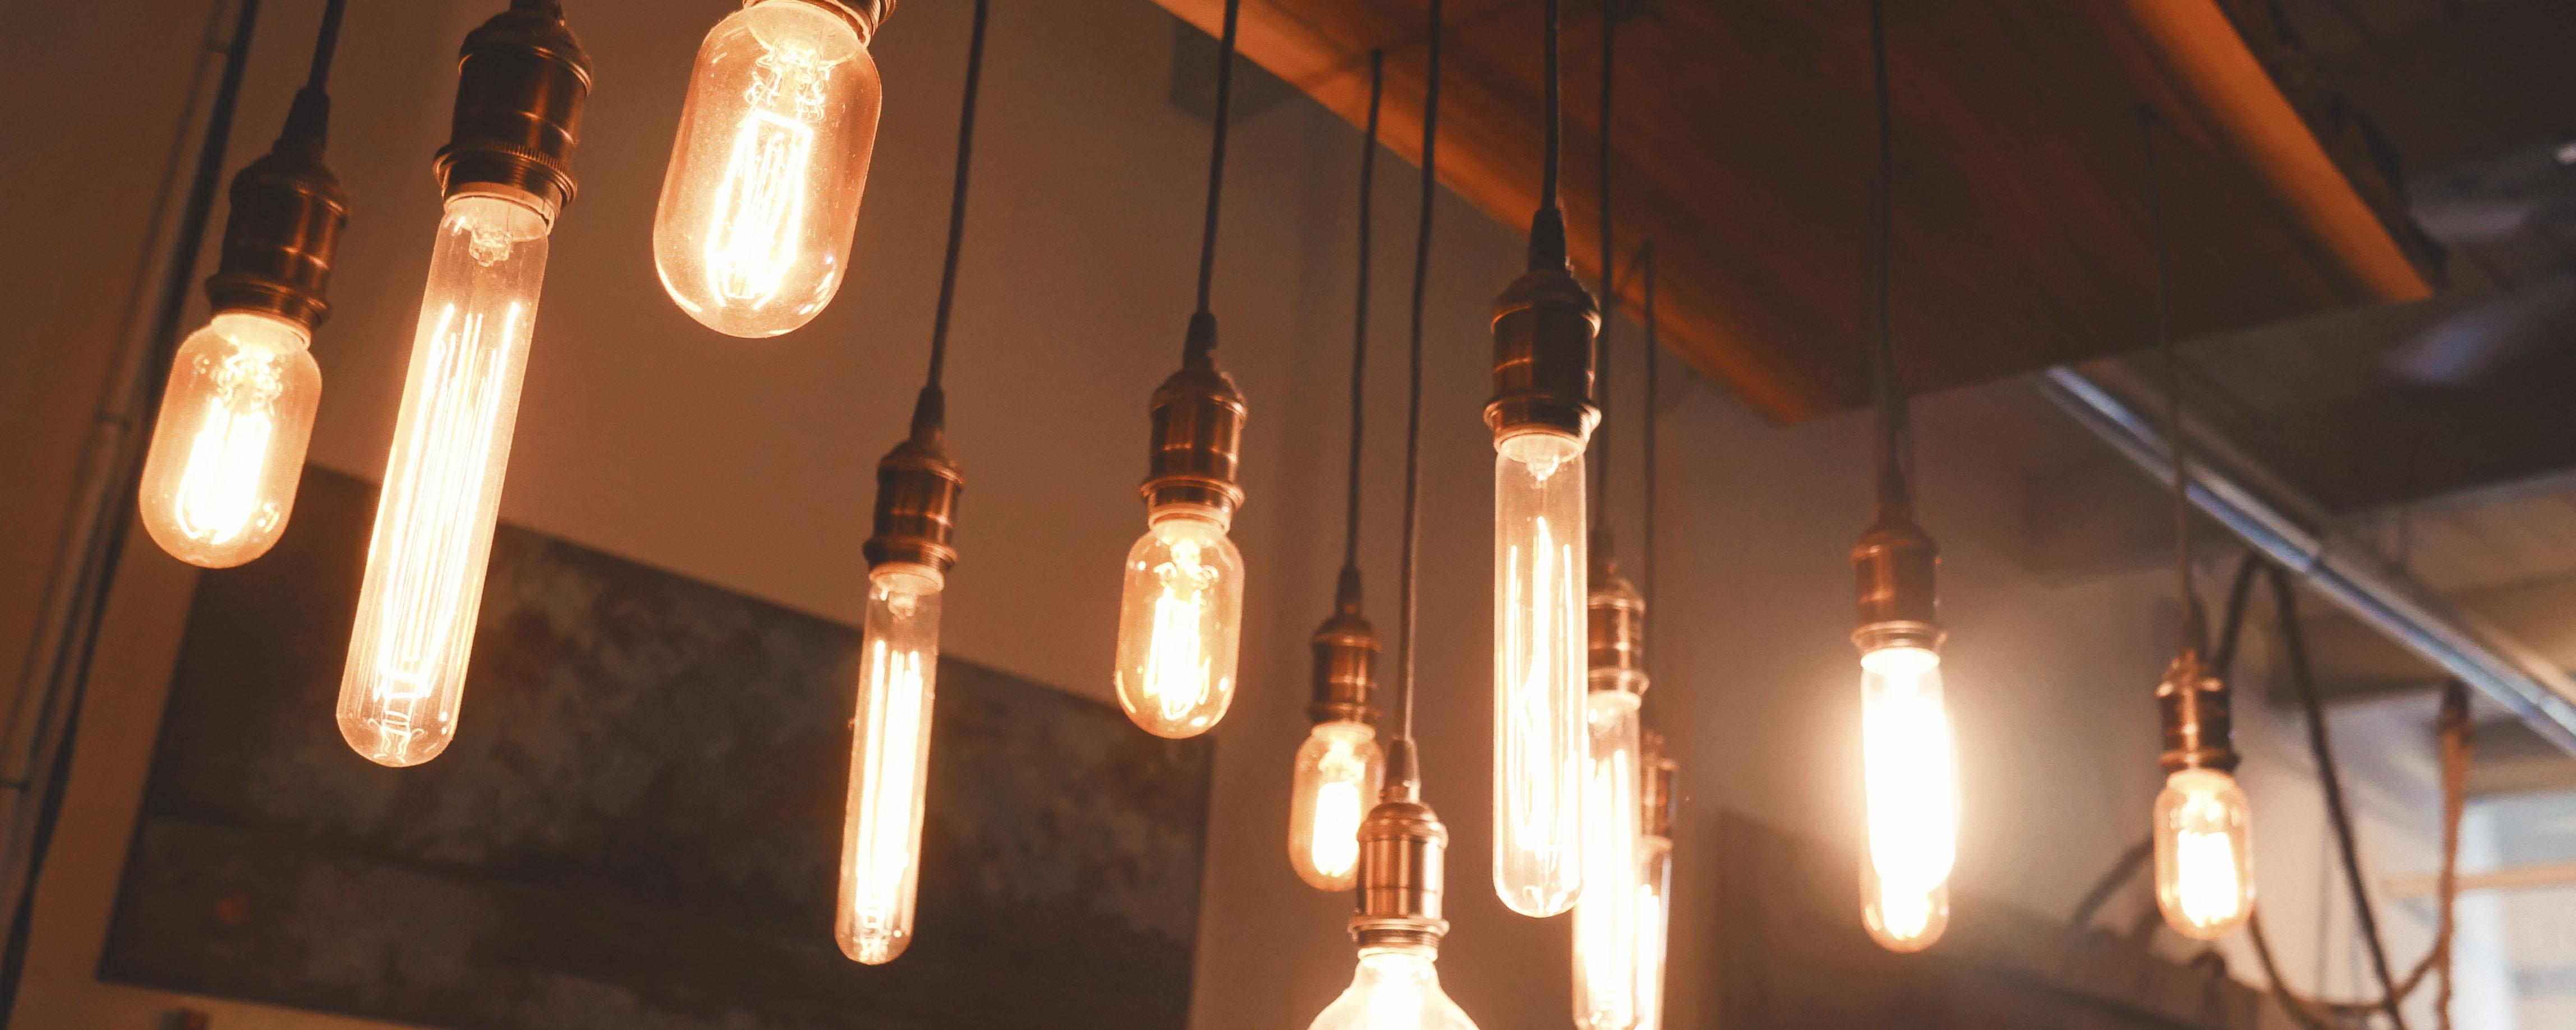 changing light bulbs.jpg